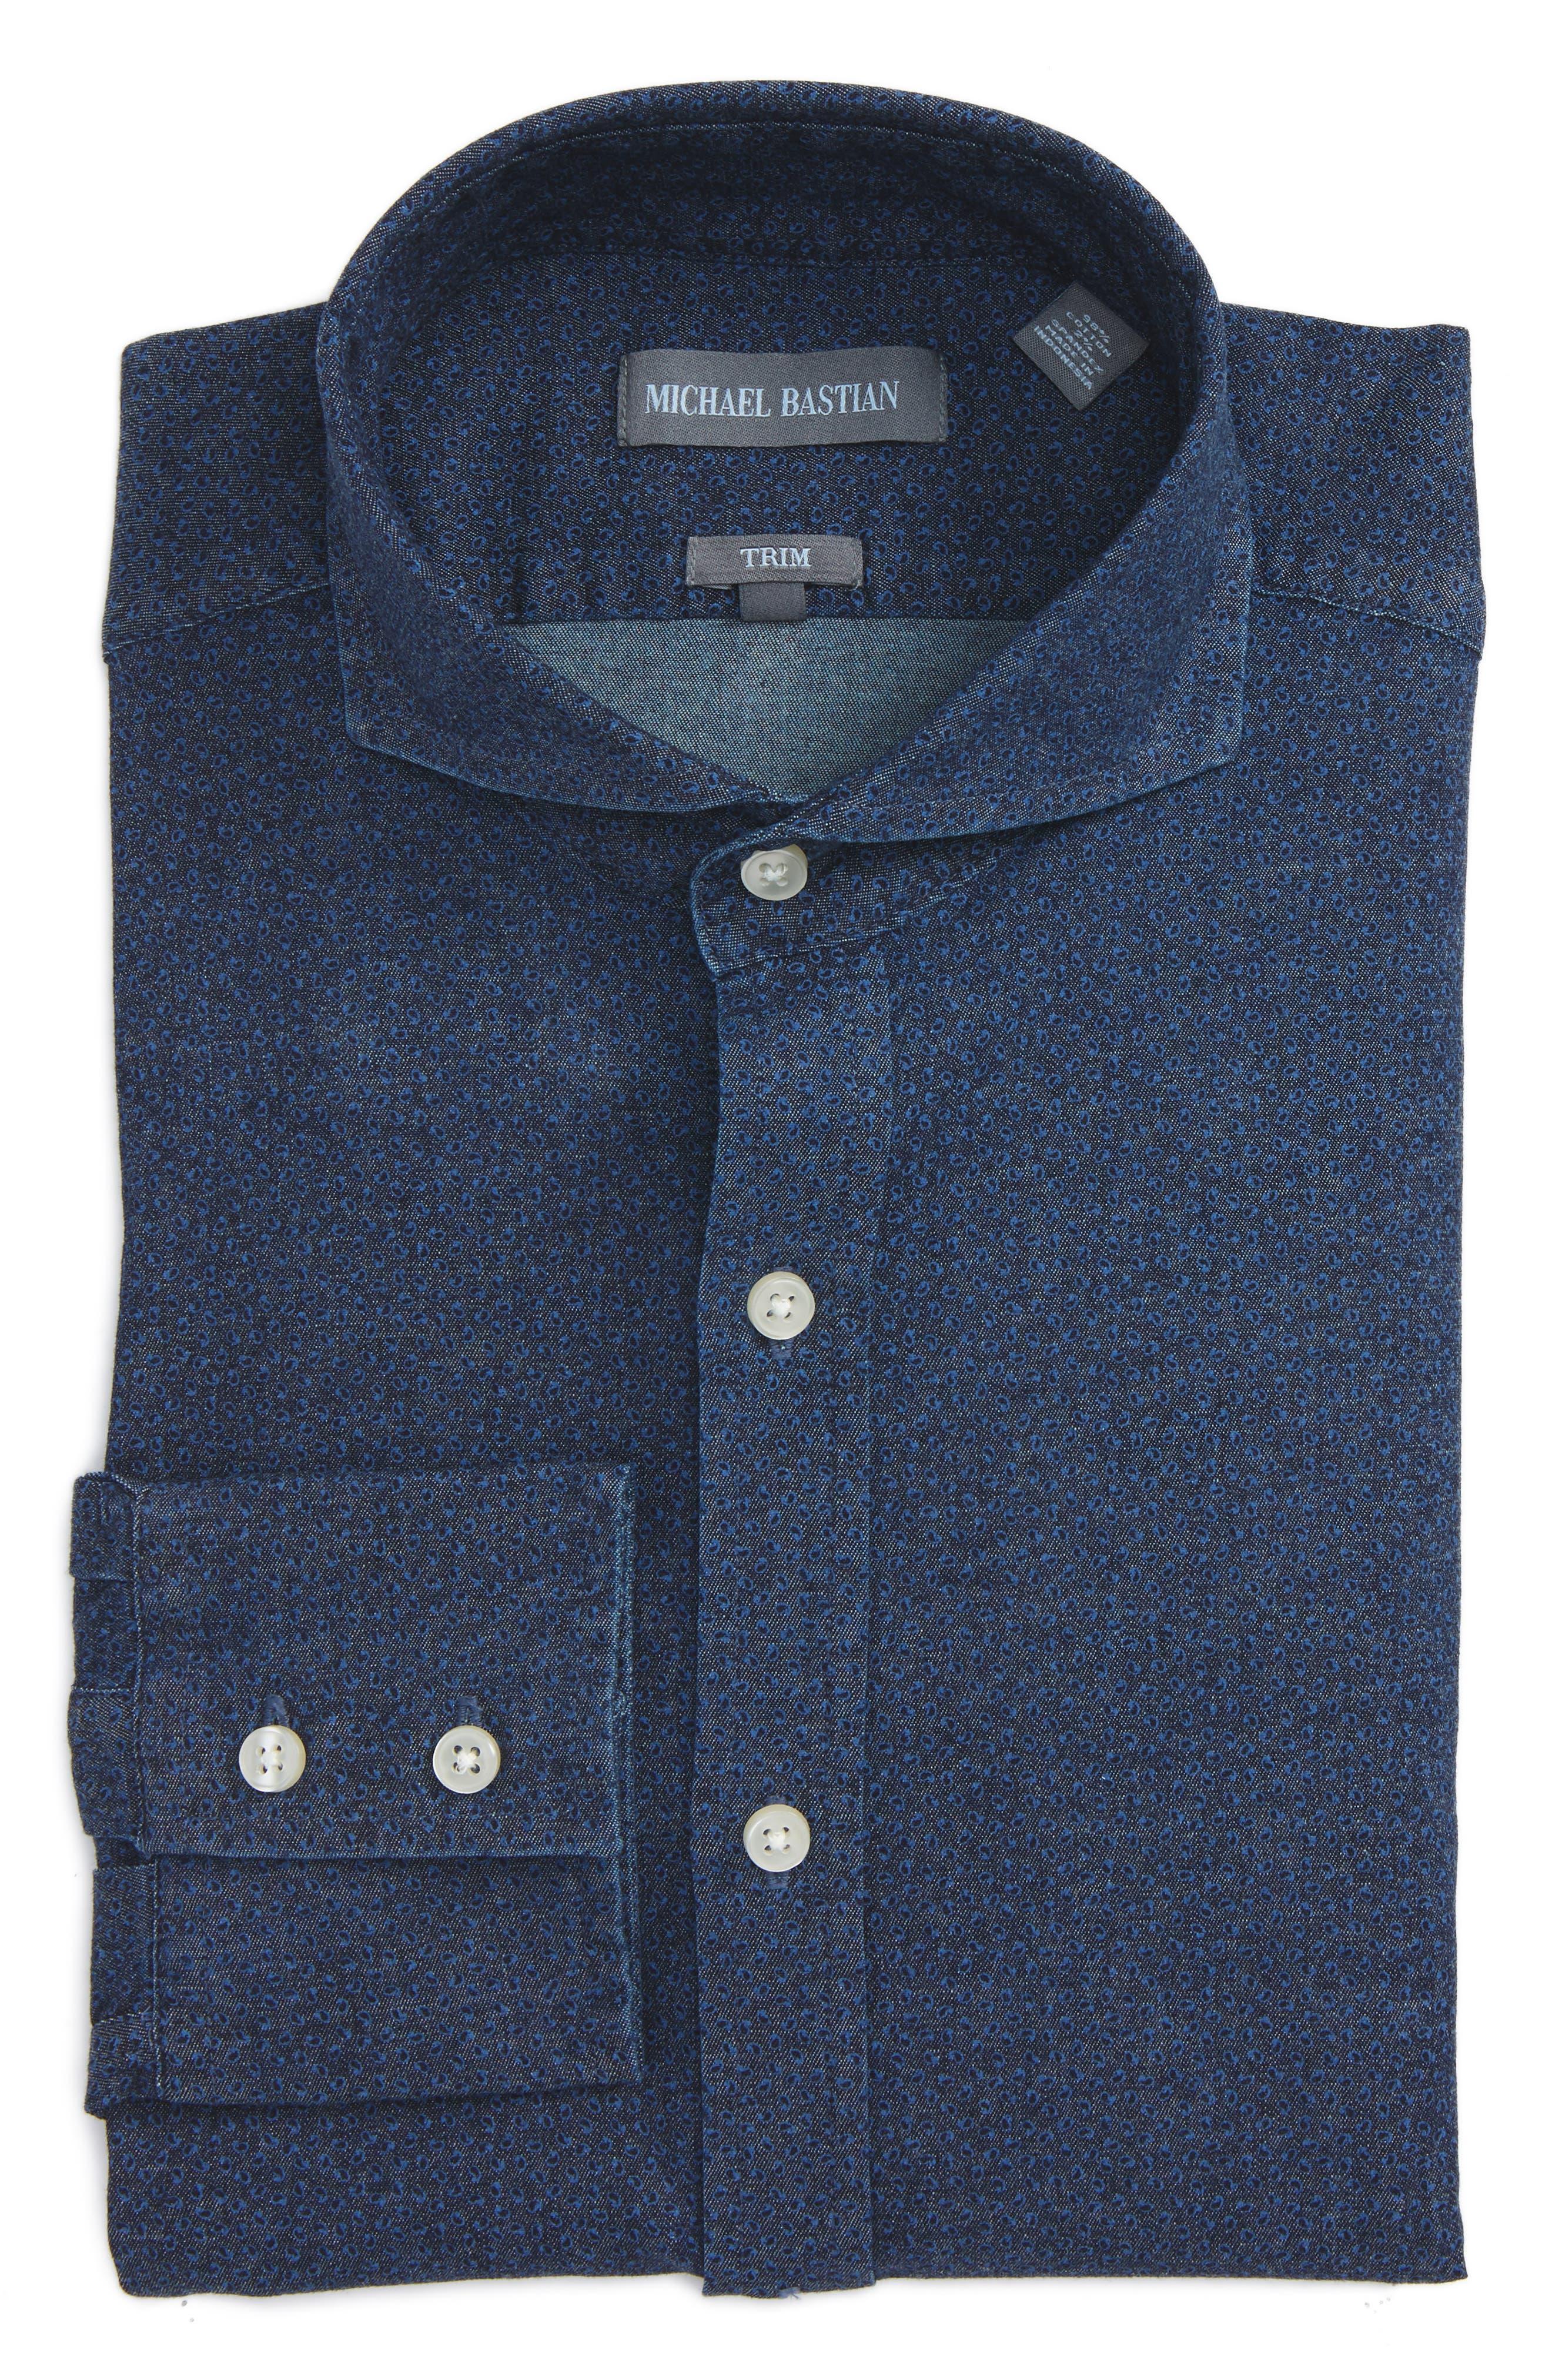 Alternate Image 1 Selected - Michael Bastian Trim Fit Cotton Twill Dress Shirt